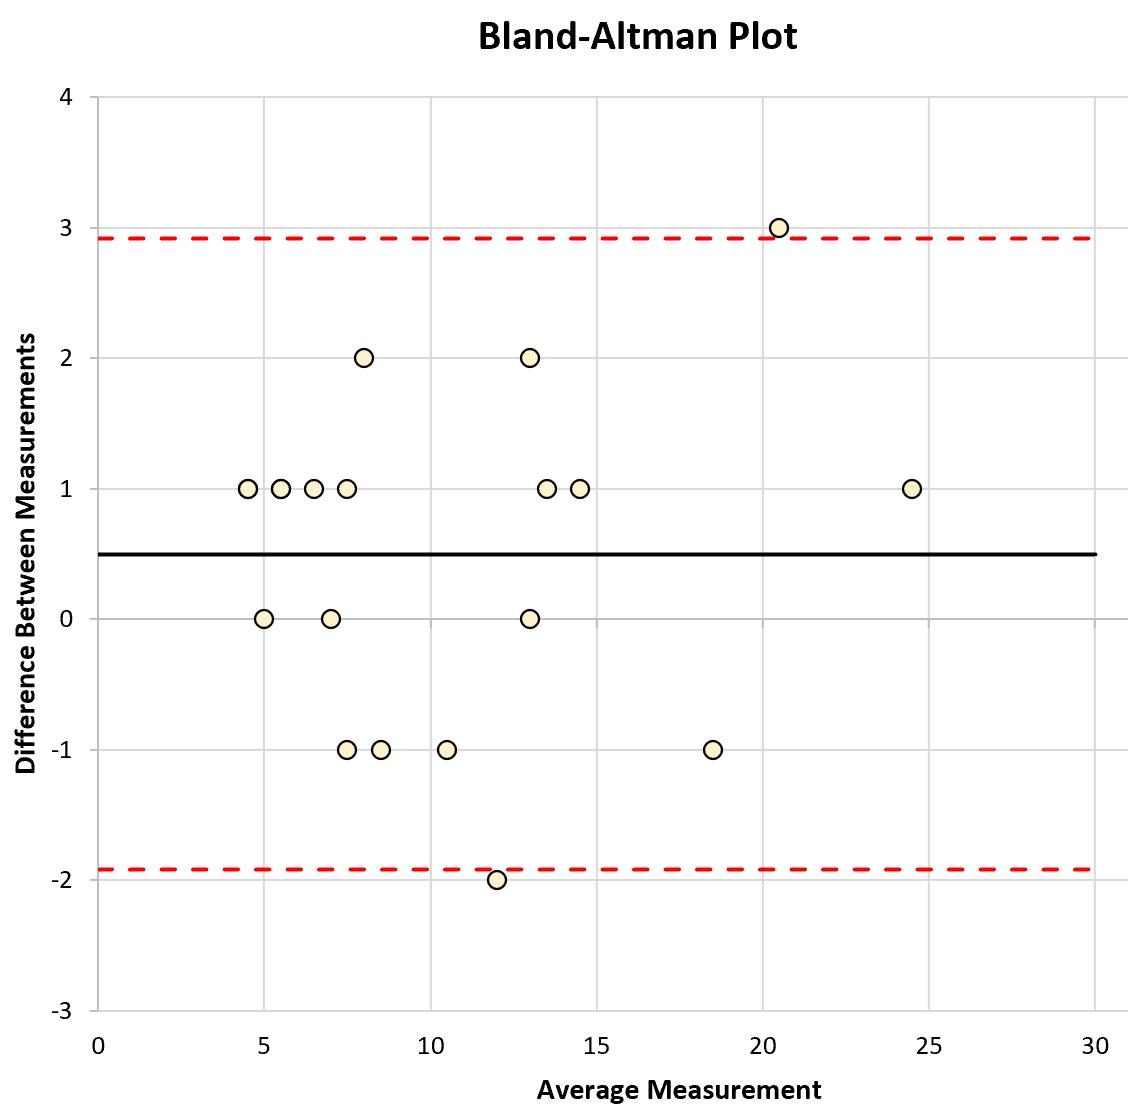 Bland-Altman plot in Excel